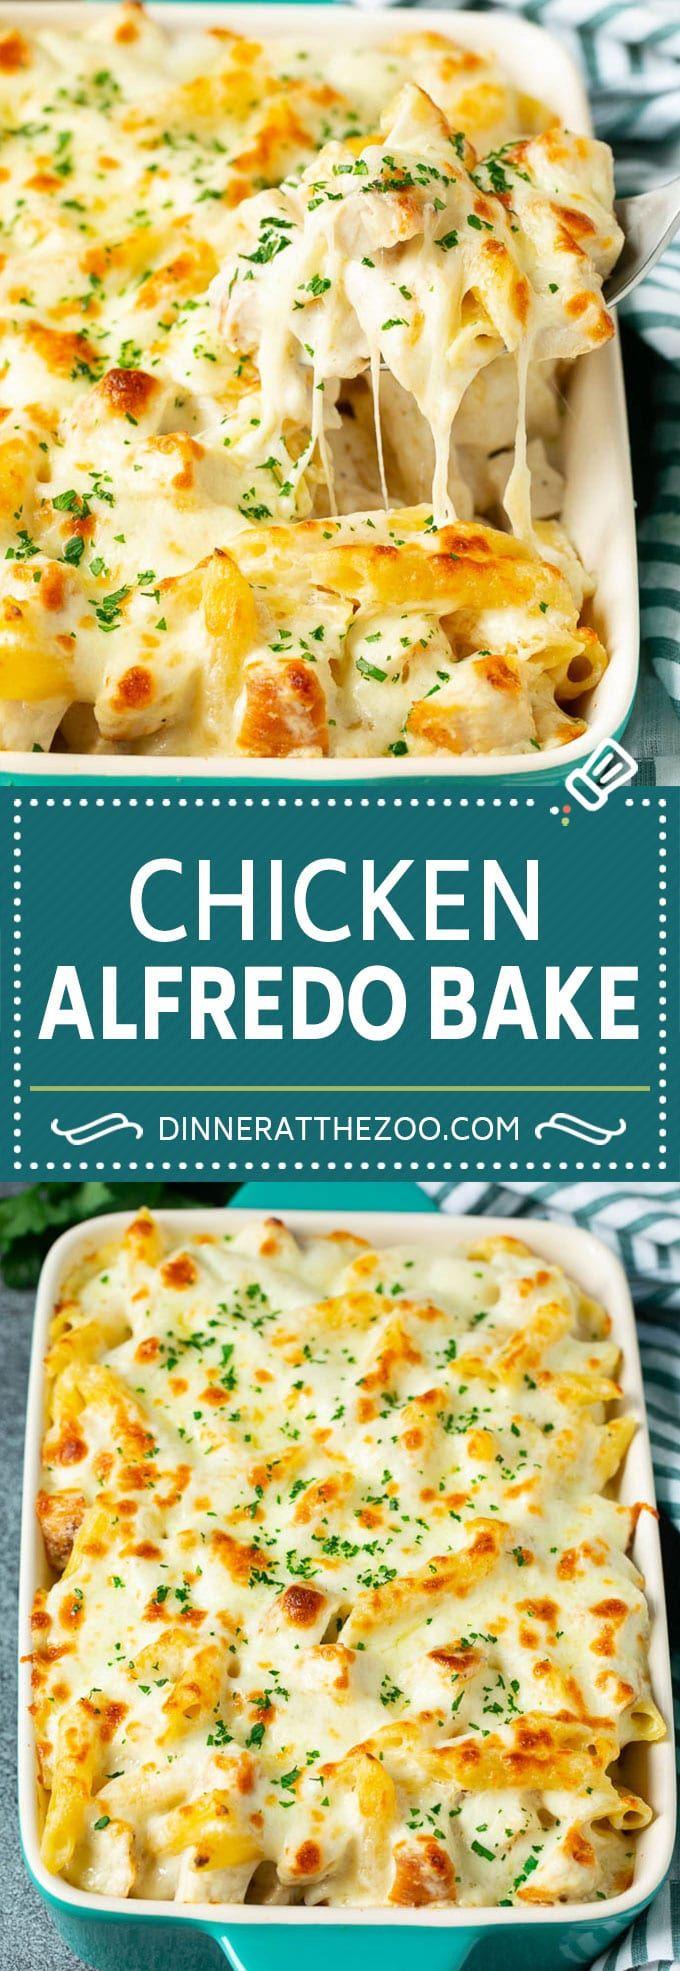 Chicken Alfredo Bake | Baked Pasta